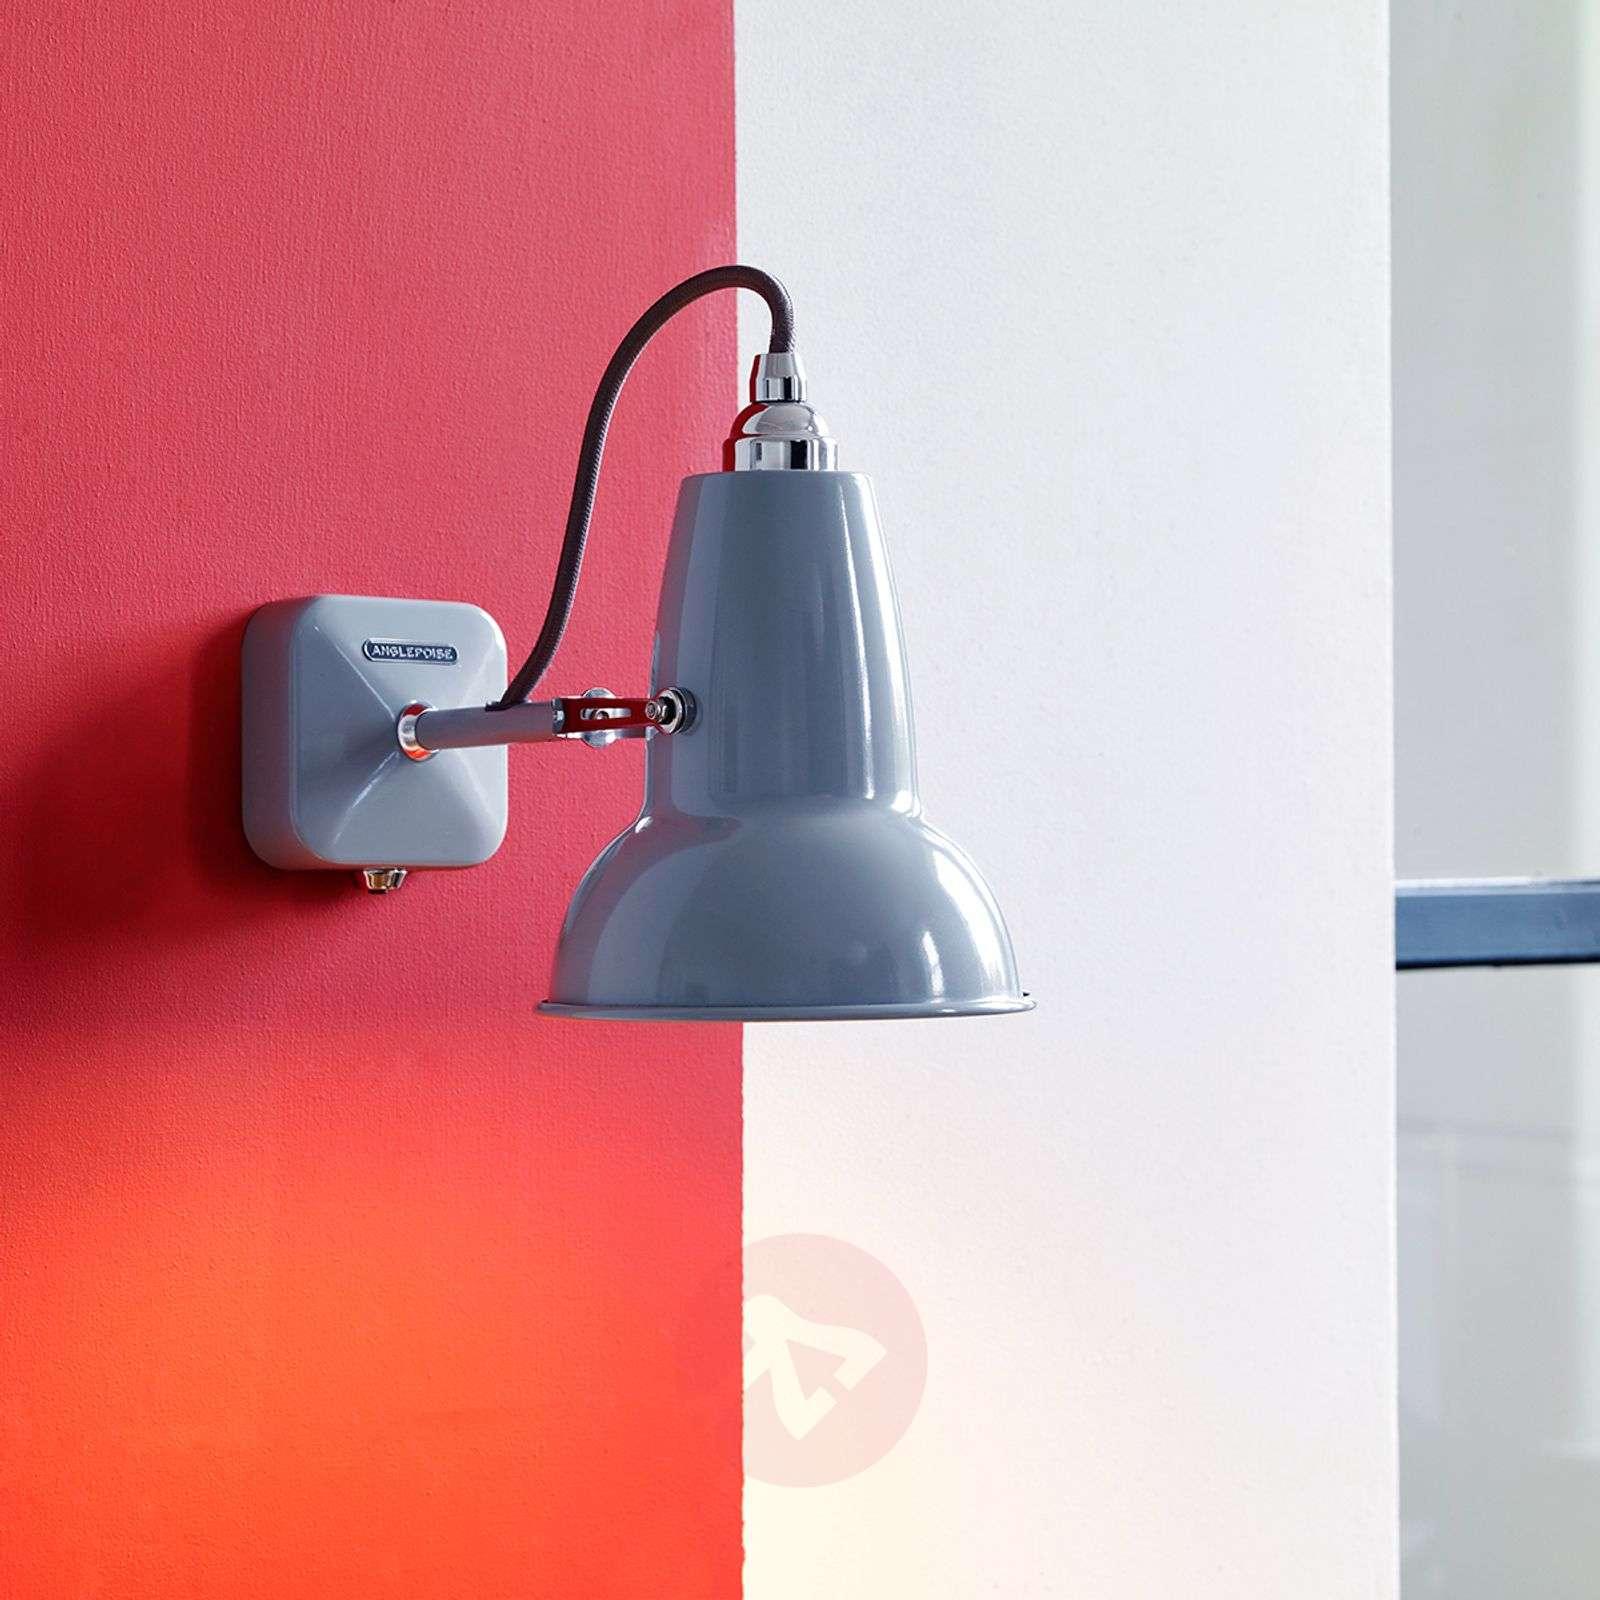 Anglepoise Original 1227 Mini wall lamp-1073089X-01